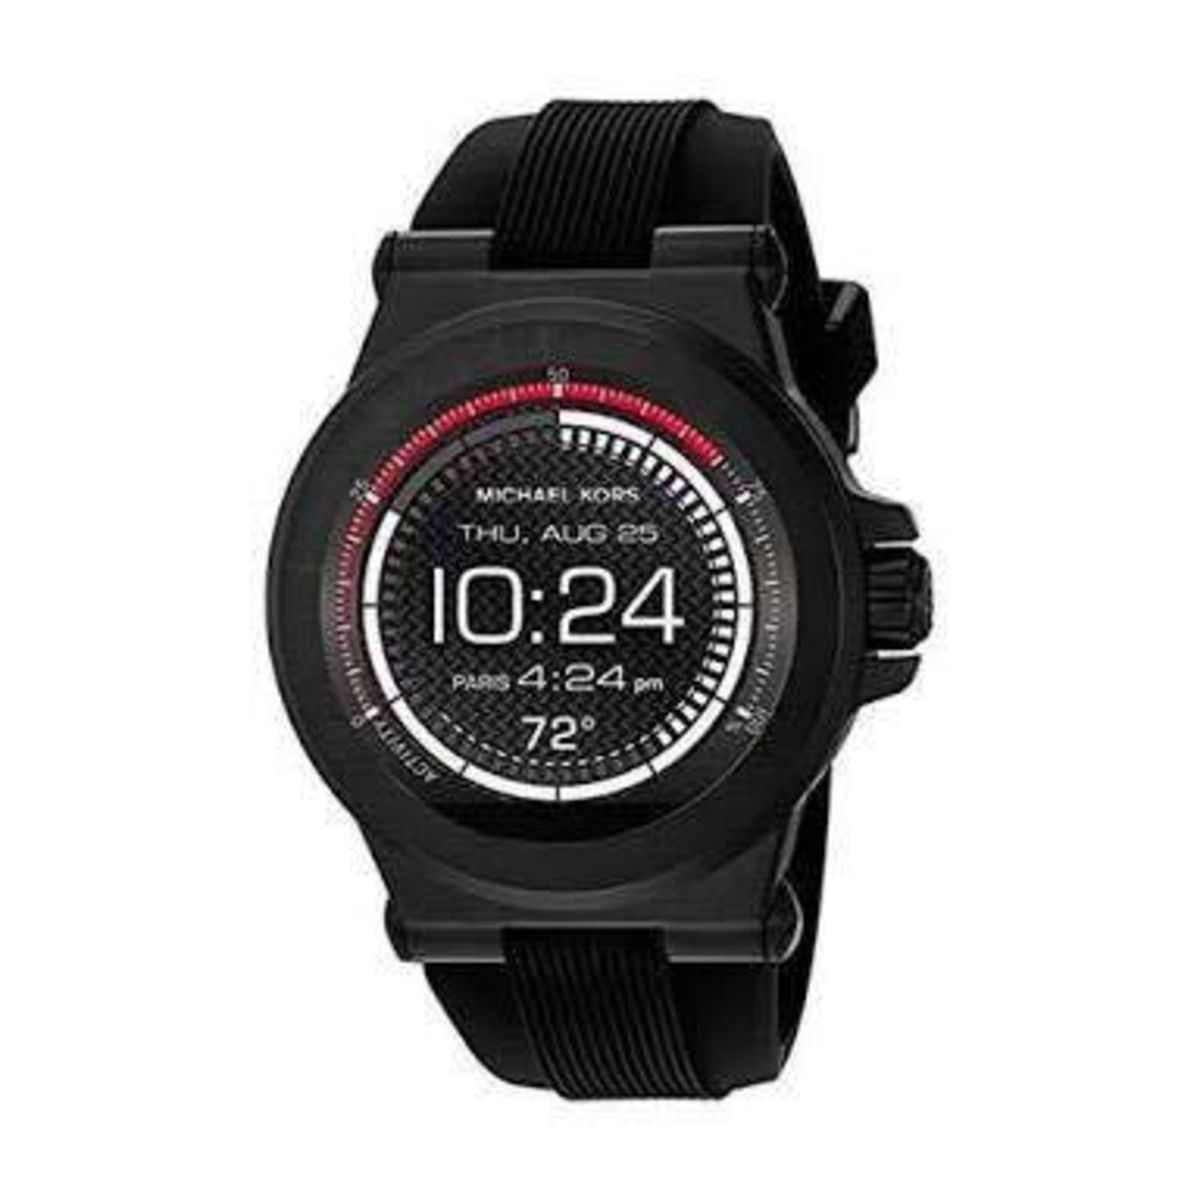 840f10a130144 Relogio Smartwatch Michael Kors Access- Unissex   Relógio Masculino ...